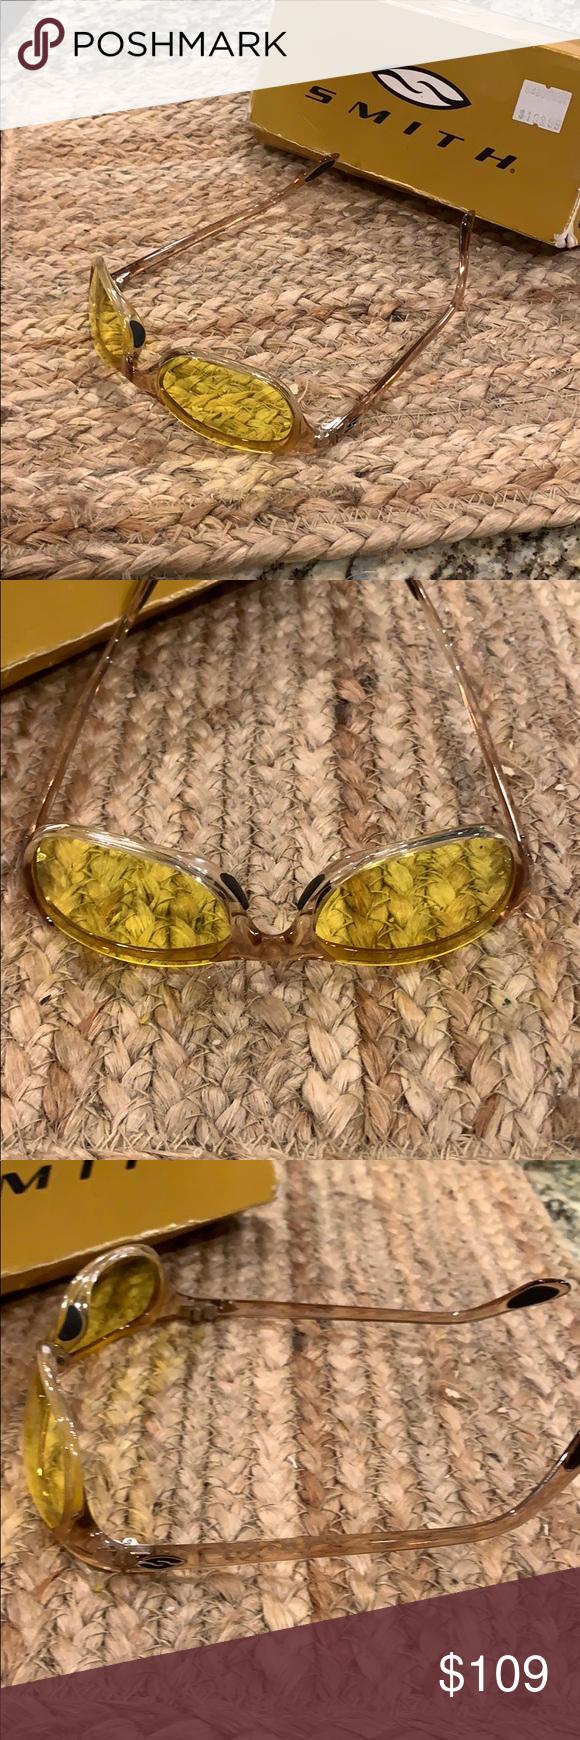 e03dfa108a Smith Toaster polarized sunglasses-slider series Smith slider series Toaster  sunglasses feature removable interchangeable lenses